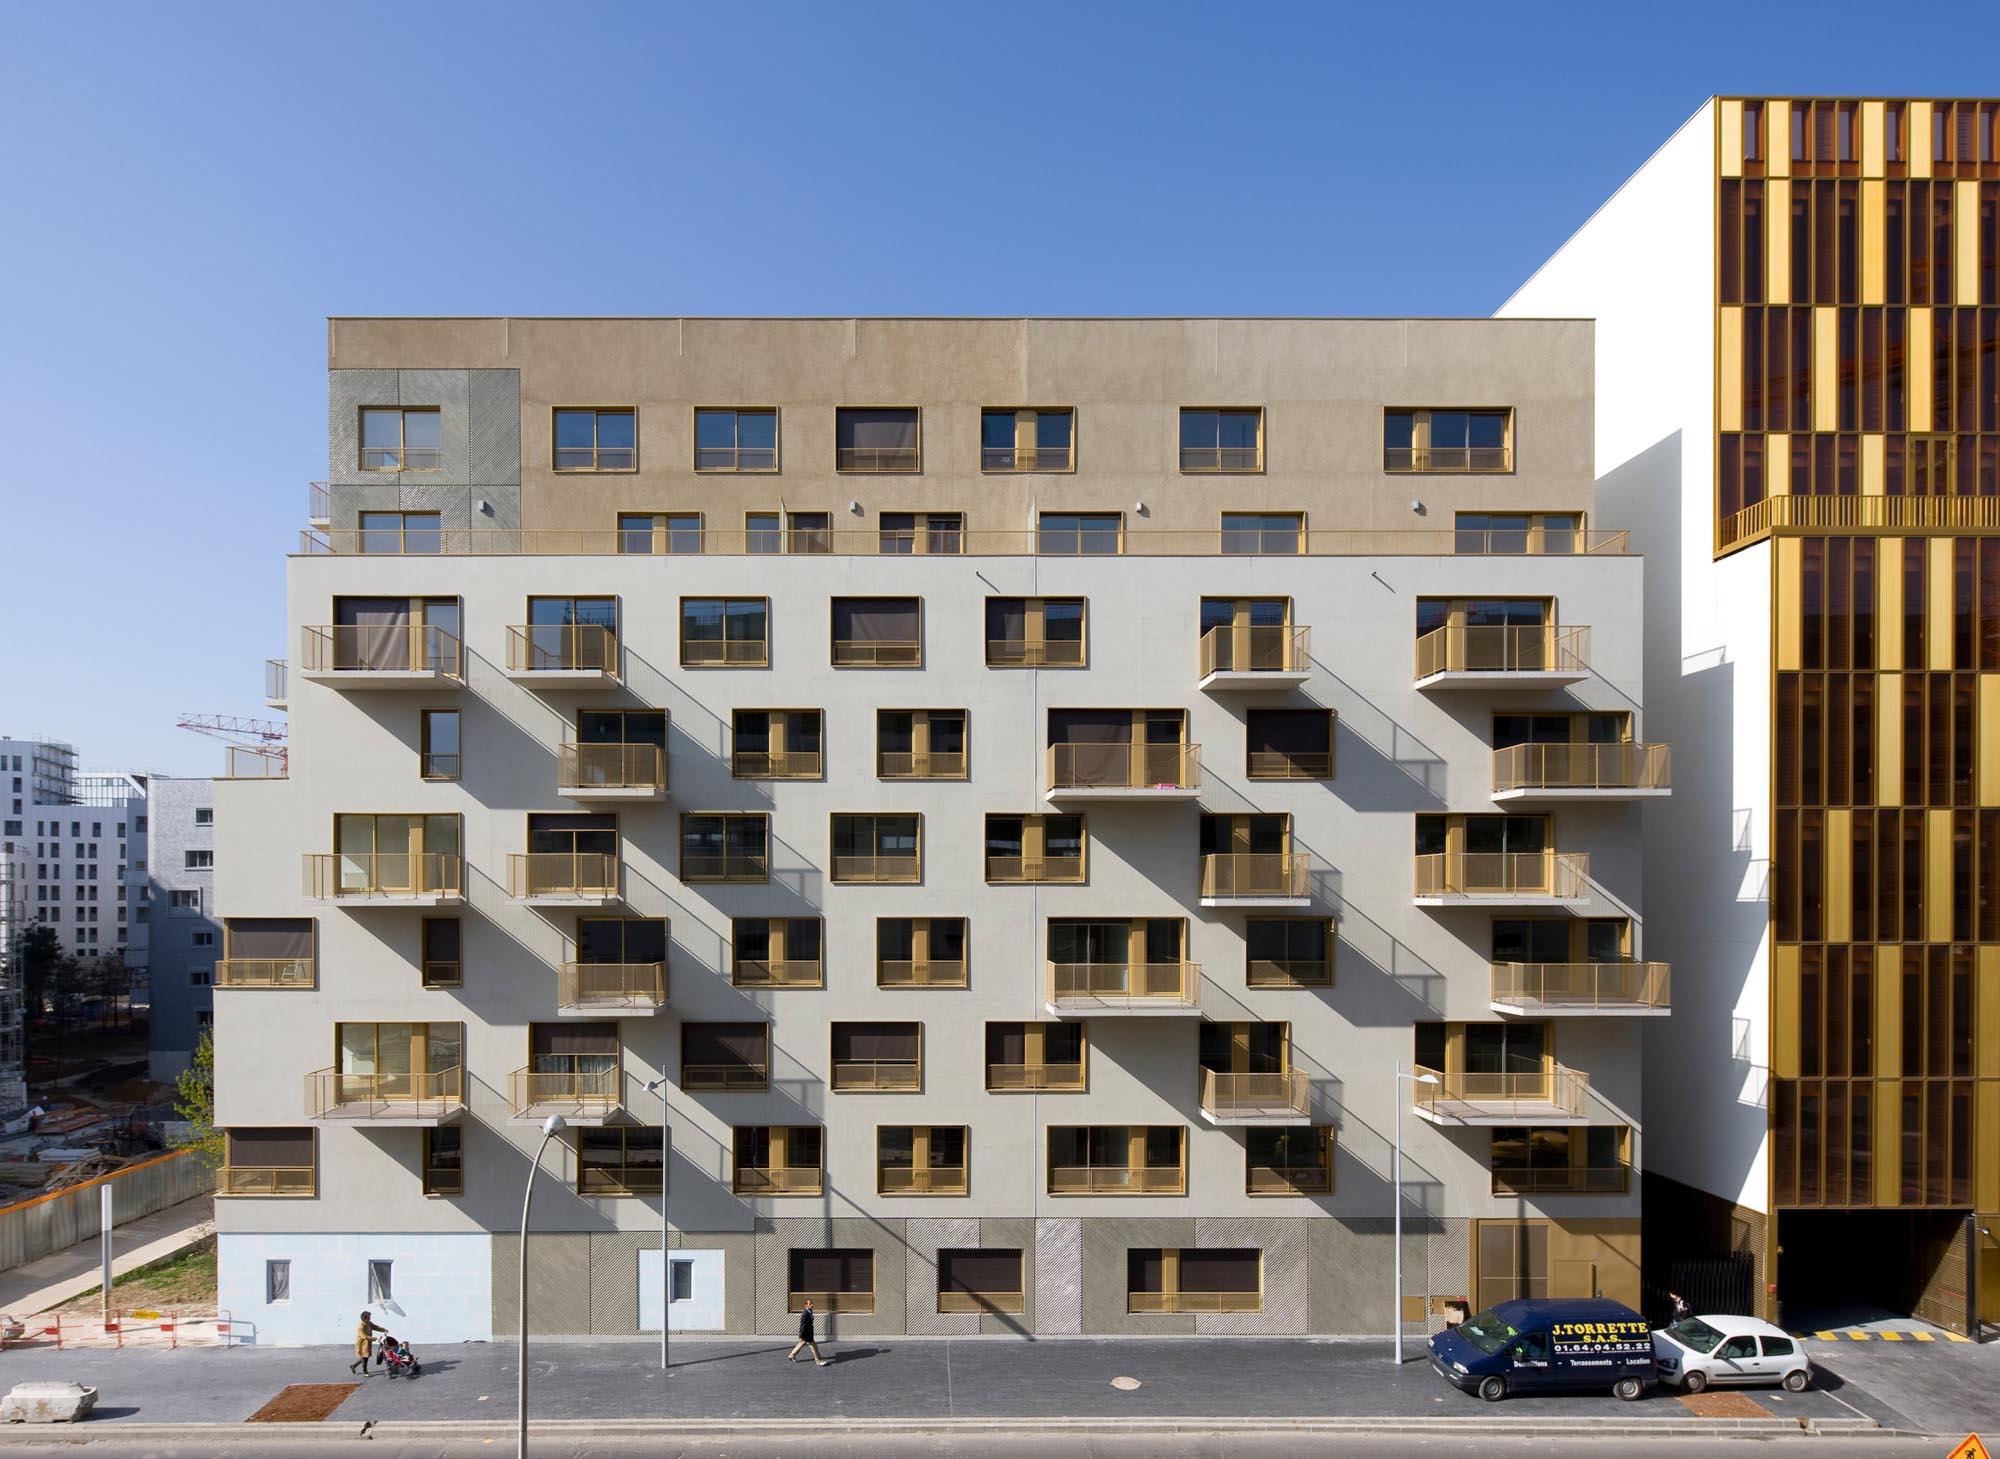 Macrolot A2, 64 housing units in Zac Seguin